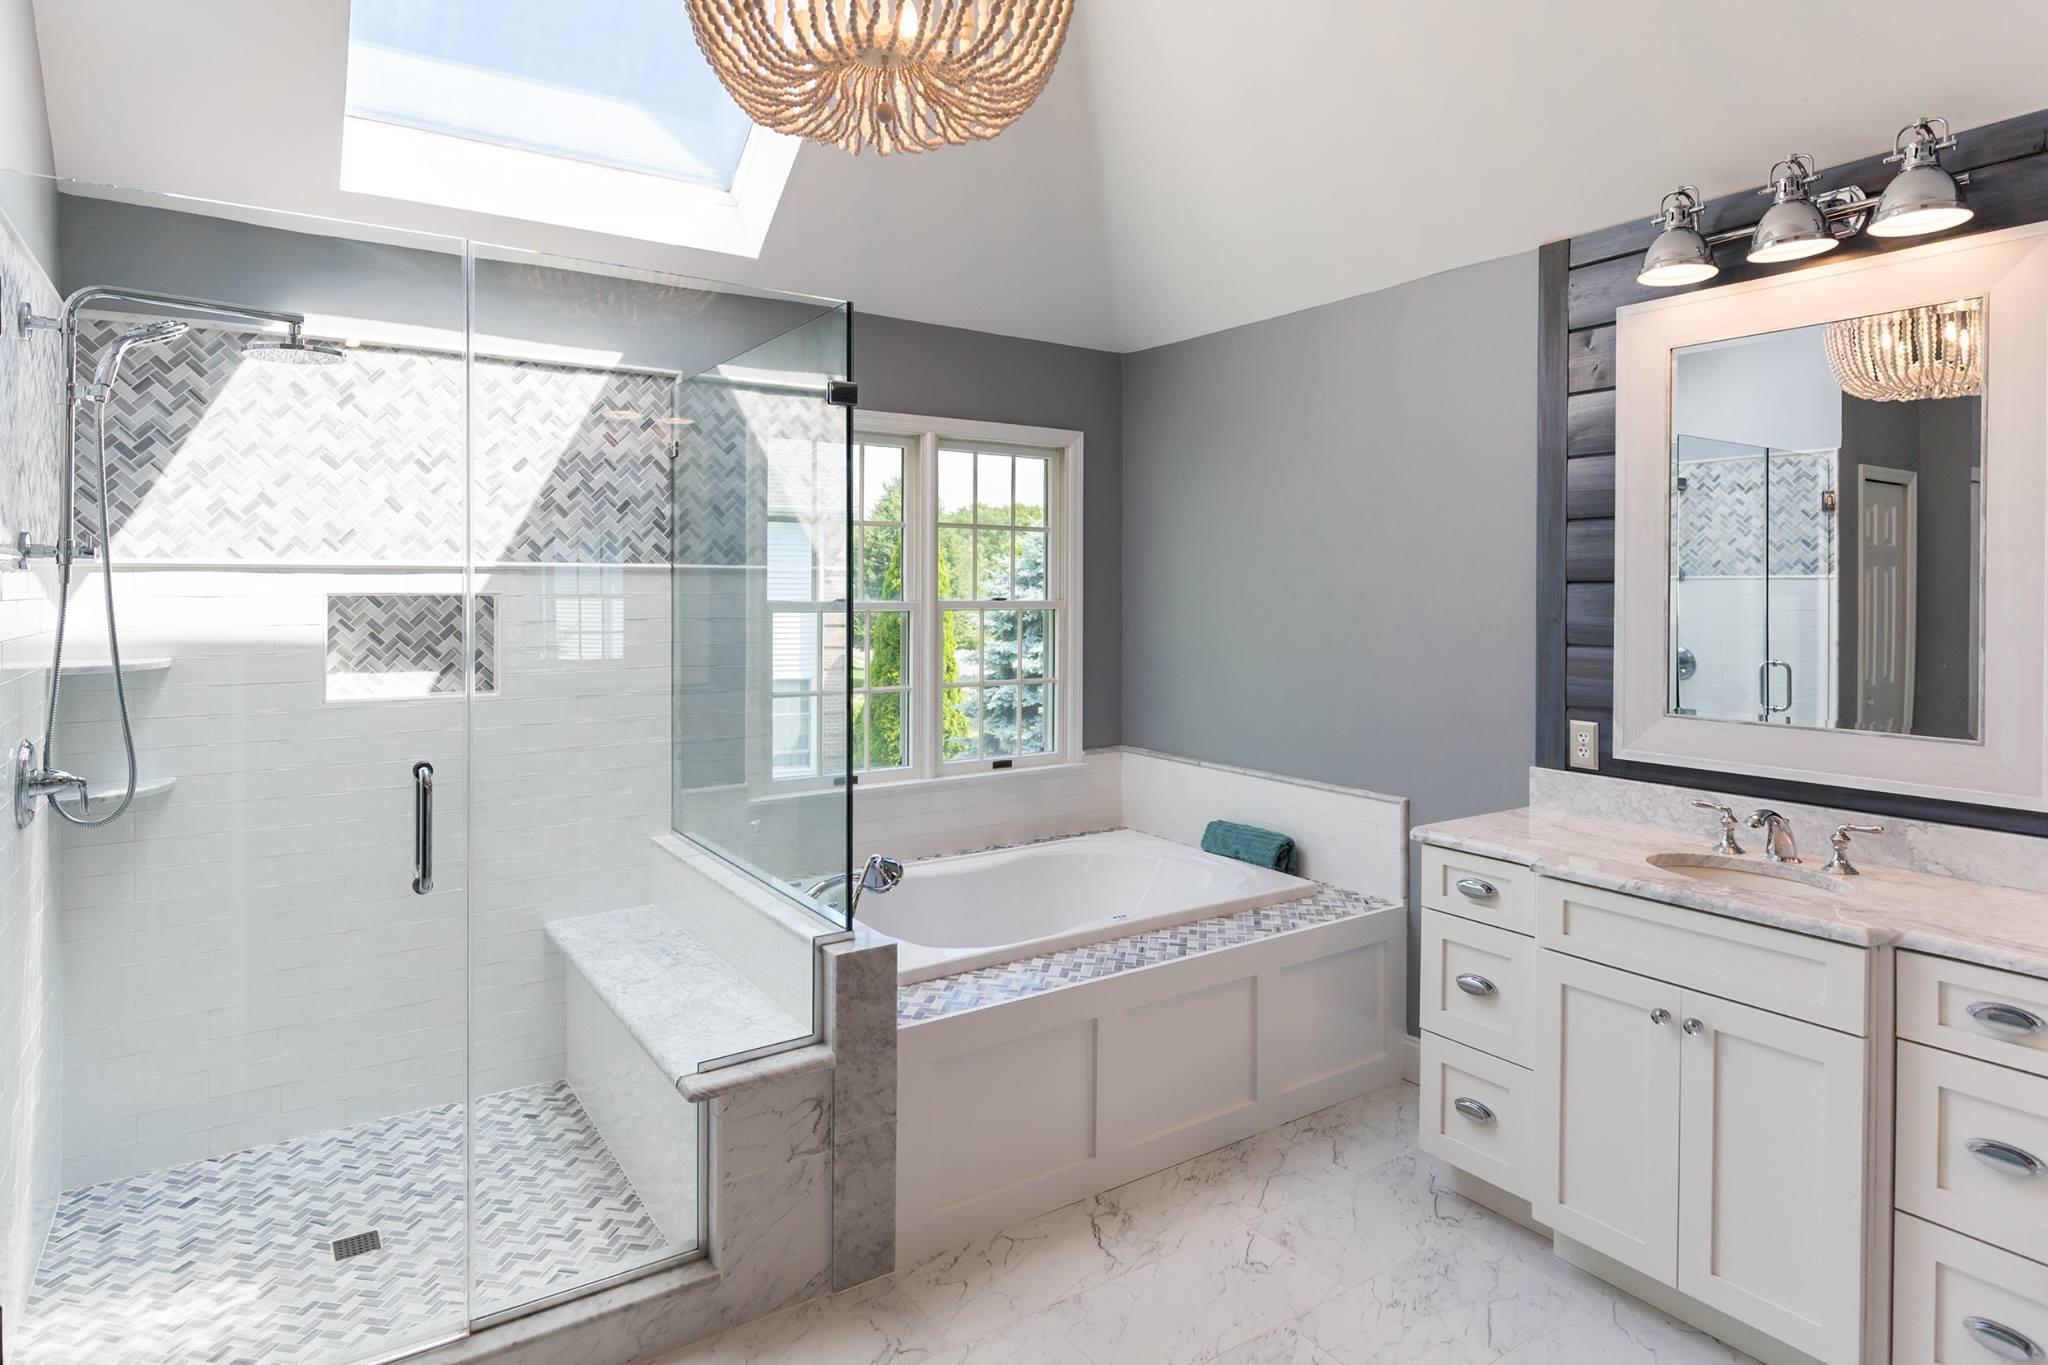 Bathroom Remodel Ideas 2020  Bathroom Remodeling in Monmouth County NJ 732 922 2020